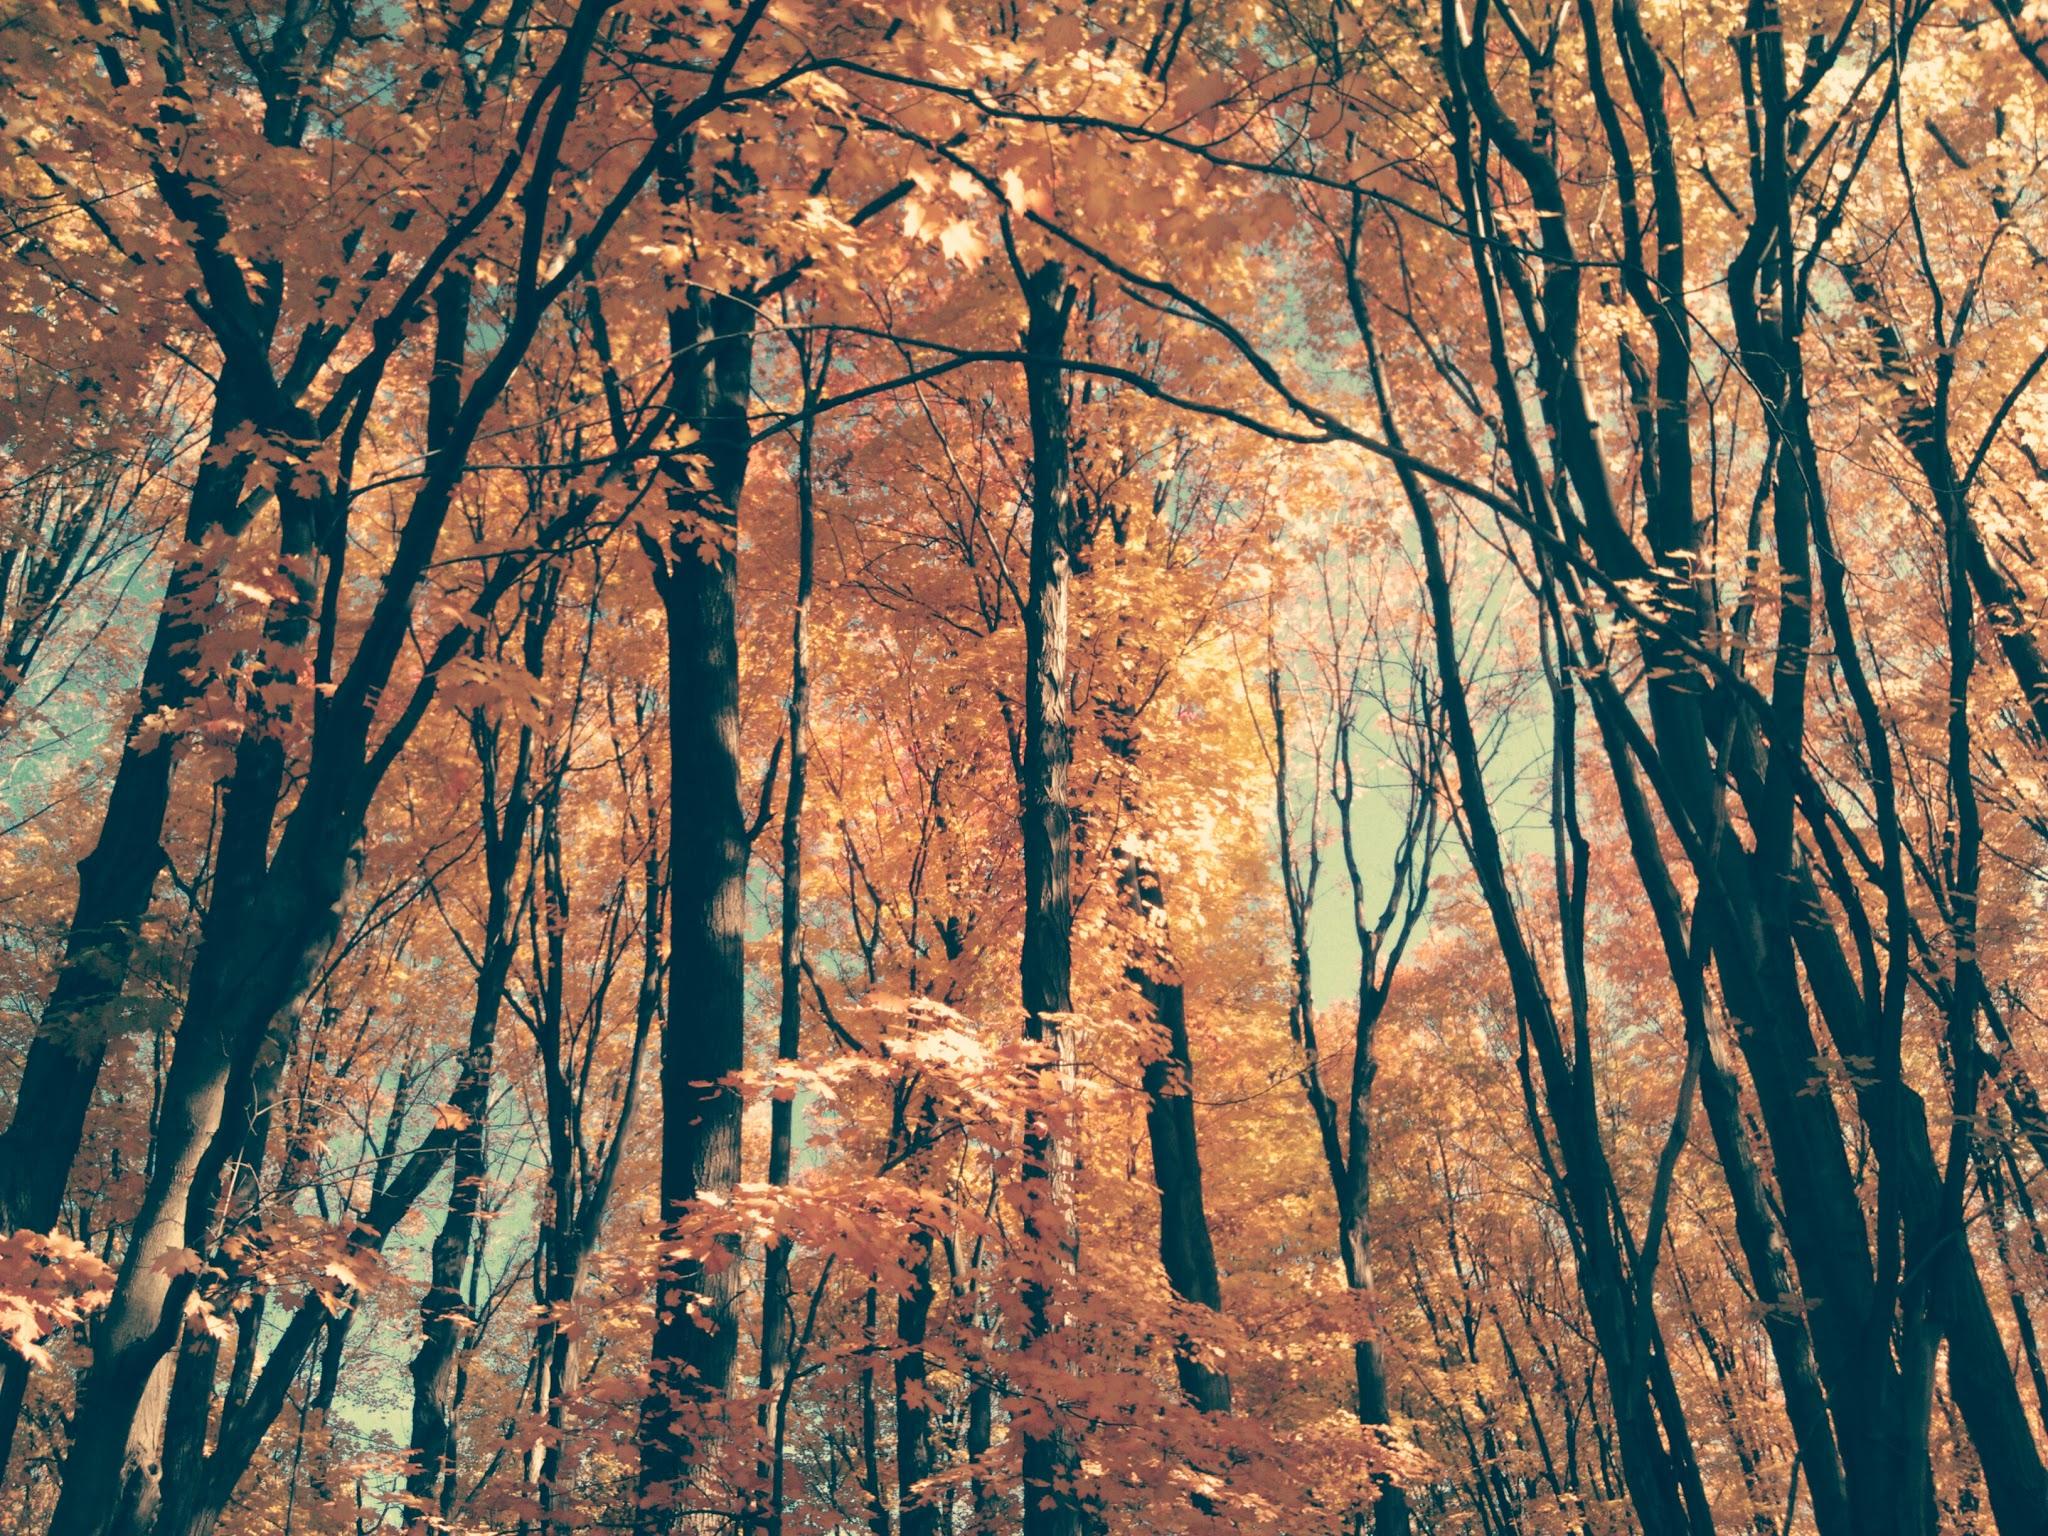 Autumn Trees at the E L  Johnson Nature Center